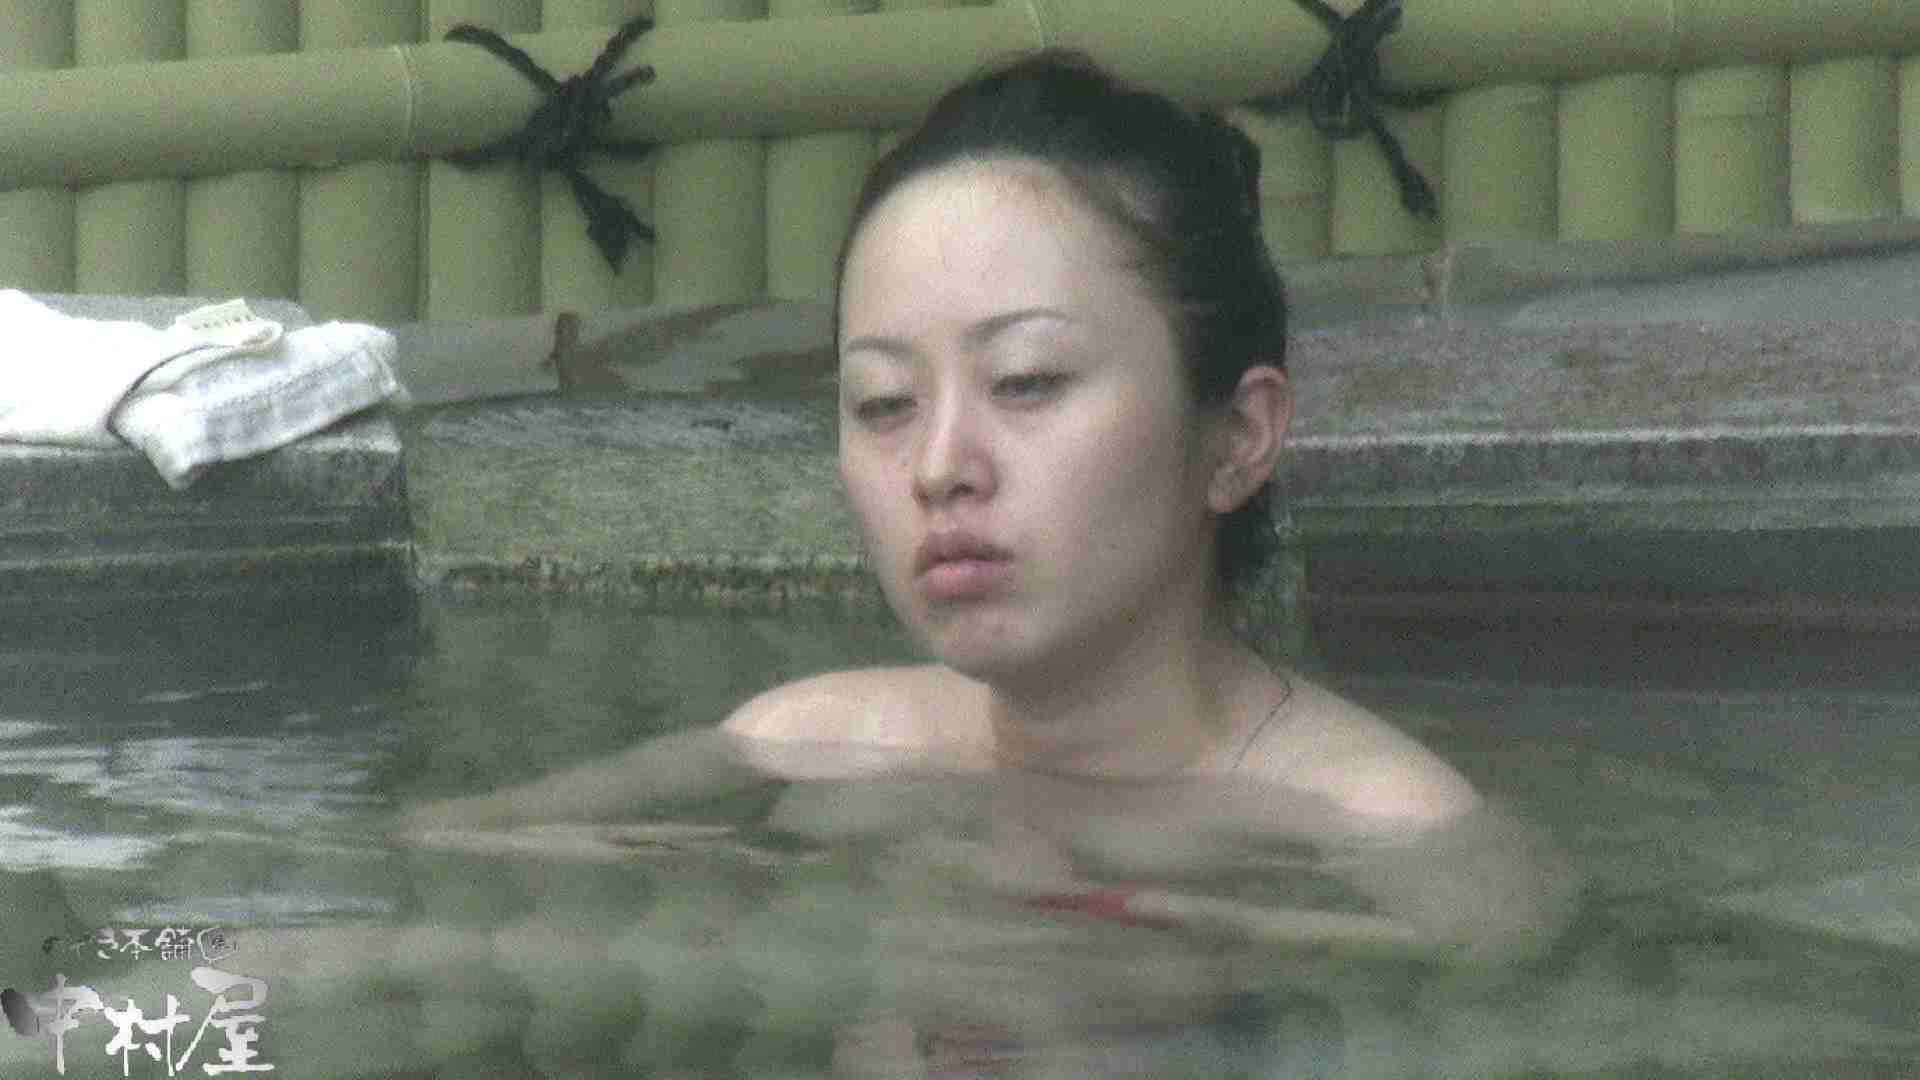 Aquaな露天風呂Vol.912 露天 AV無料動画キャプチャ 62画像 38